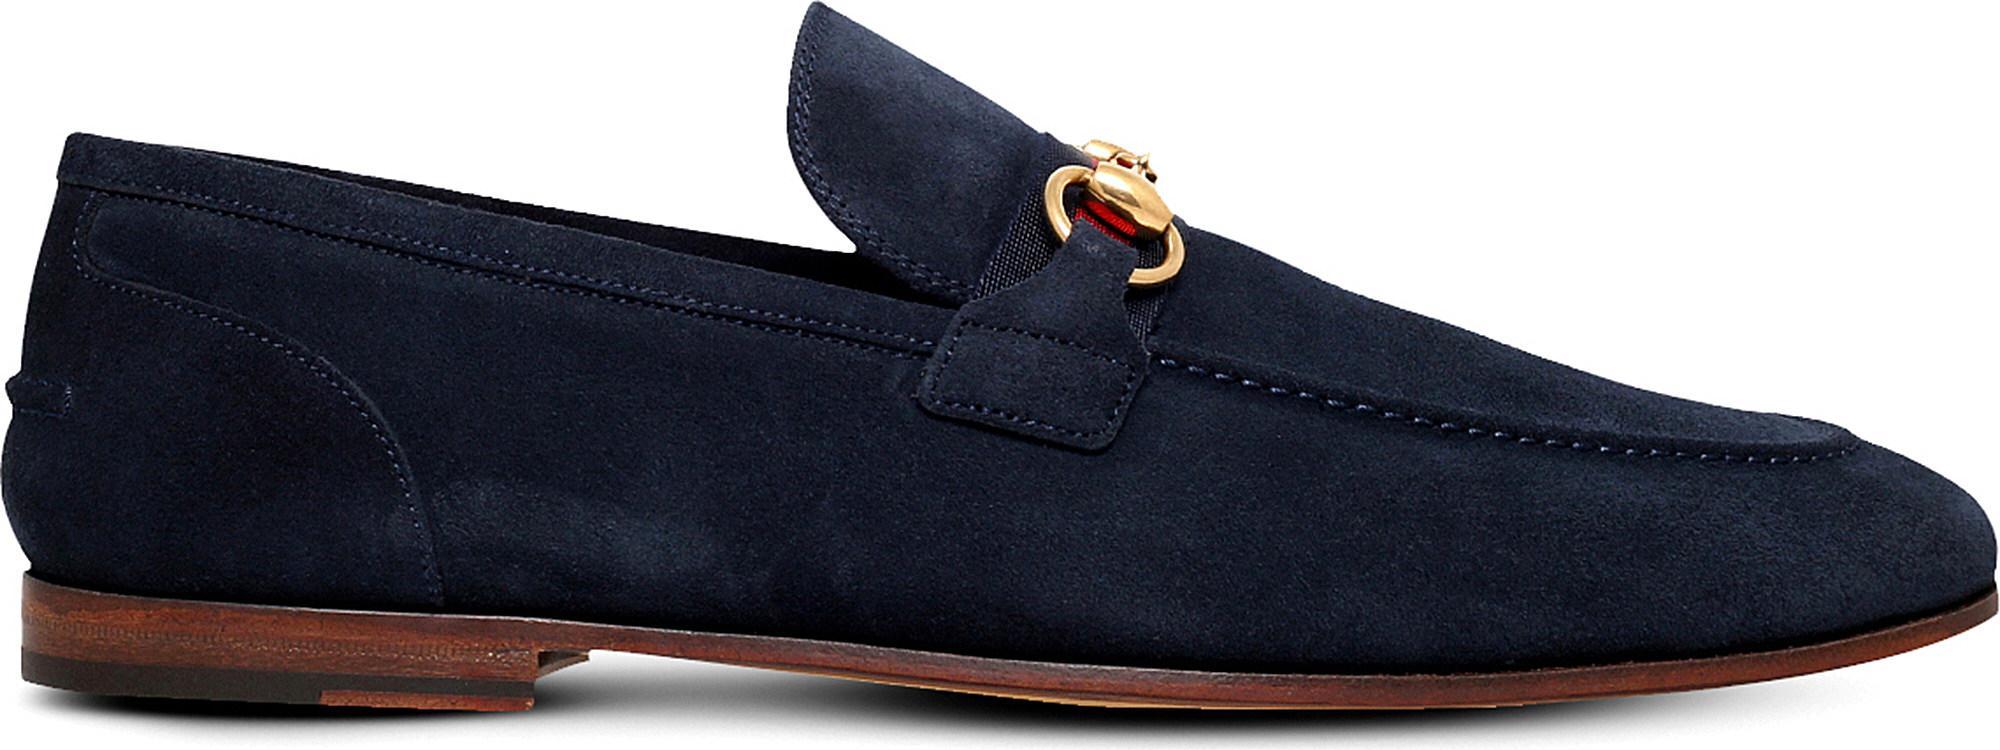 4554734dff3 Gucci Elanor Horsebit Suede Loafers in Black for Men - Lyst